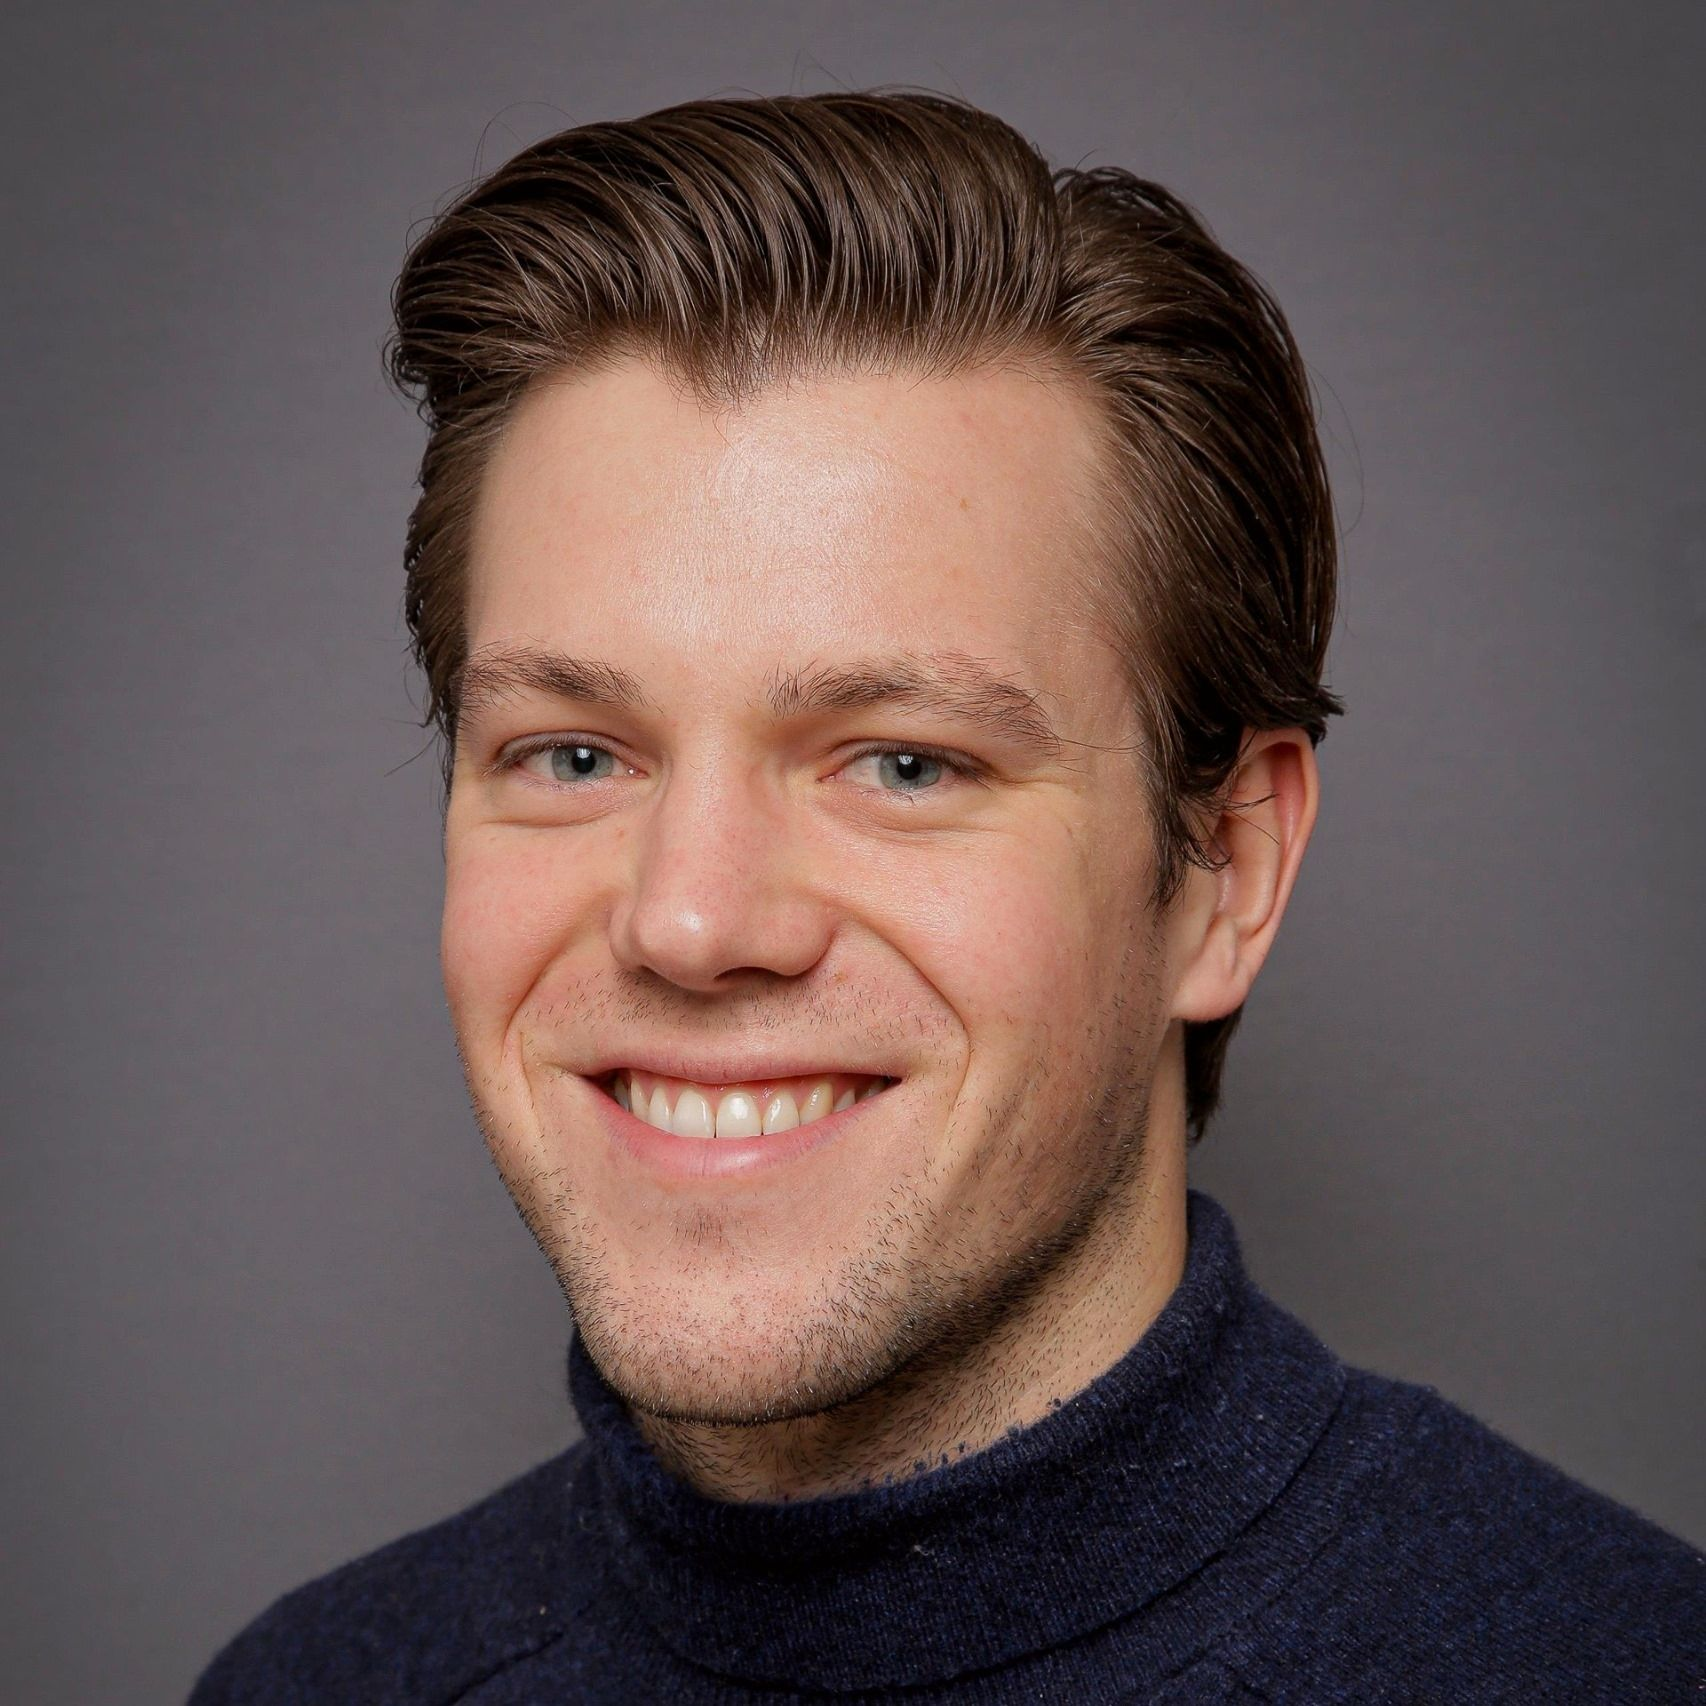 Stefan Hotvedt